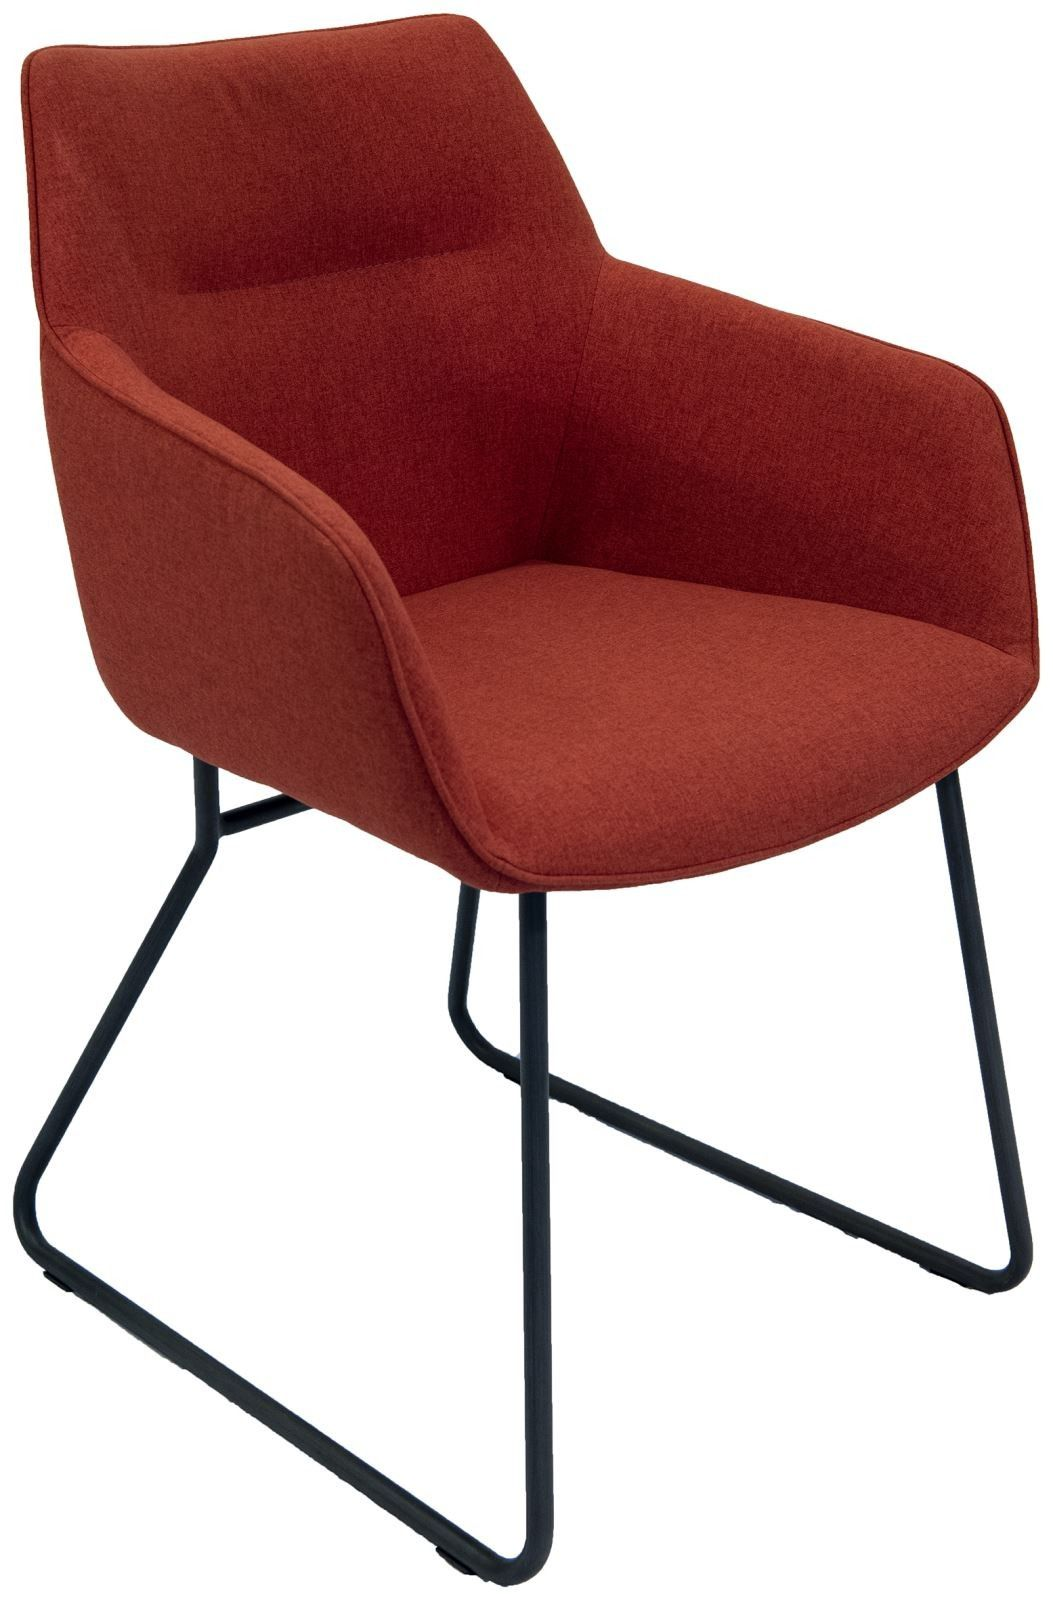 Ericka Dining Chair Orange